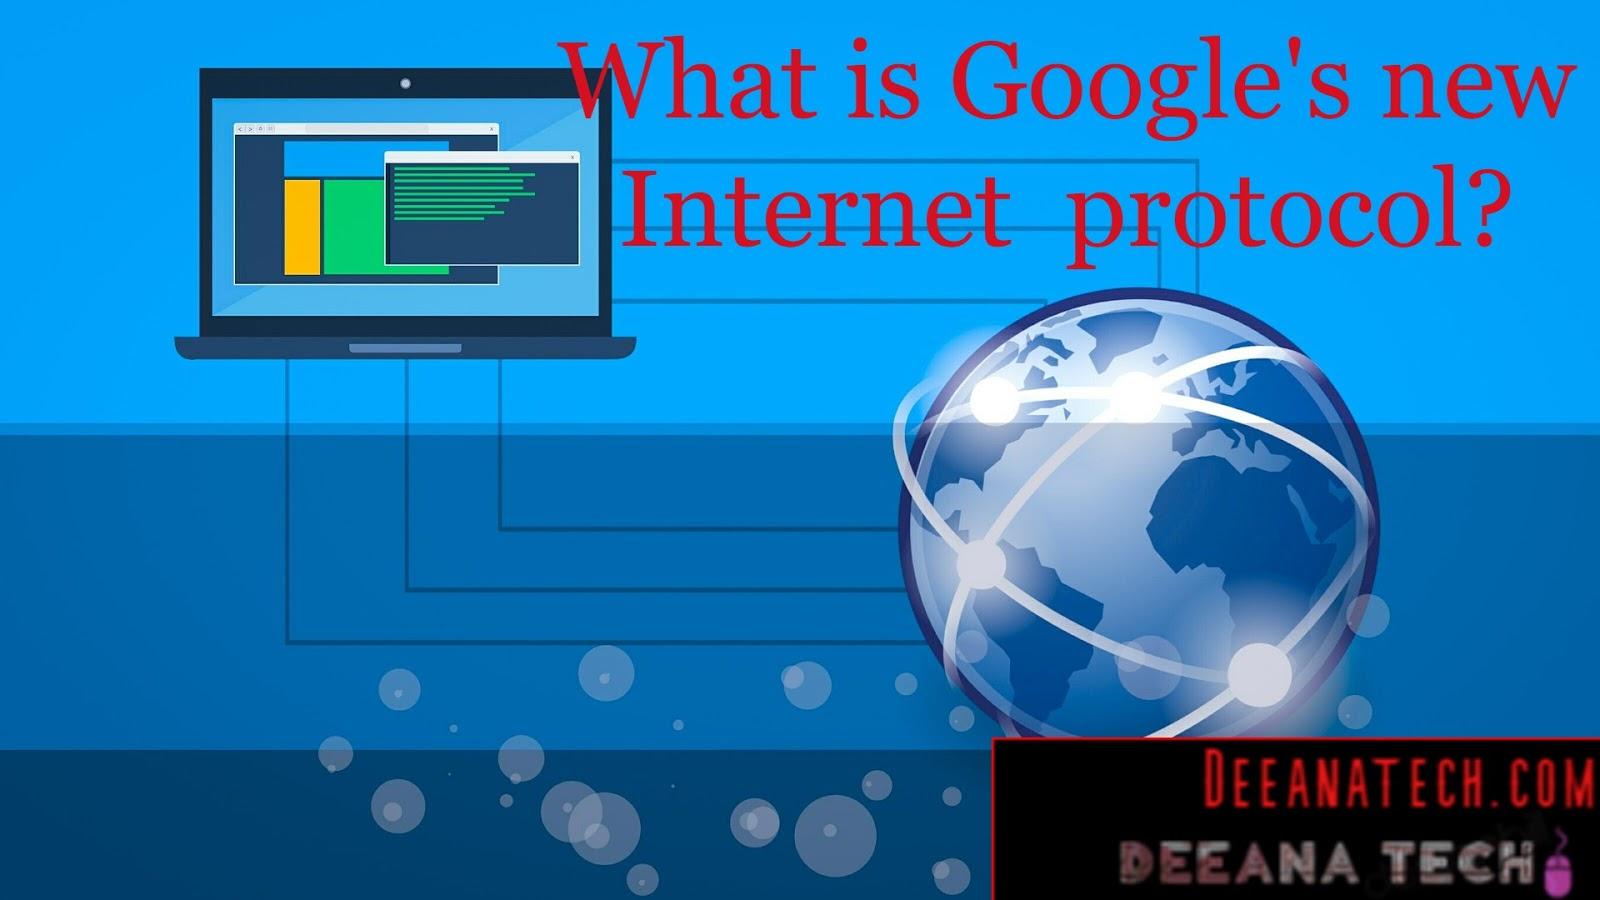 Latest Internet Protocol IP of Google    Internet Protocol In Hindi   Google Ka Naya Protocol Kya hai  